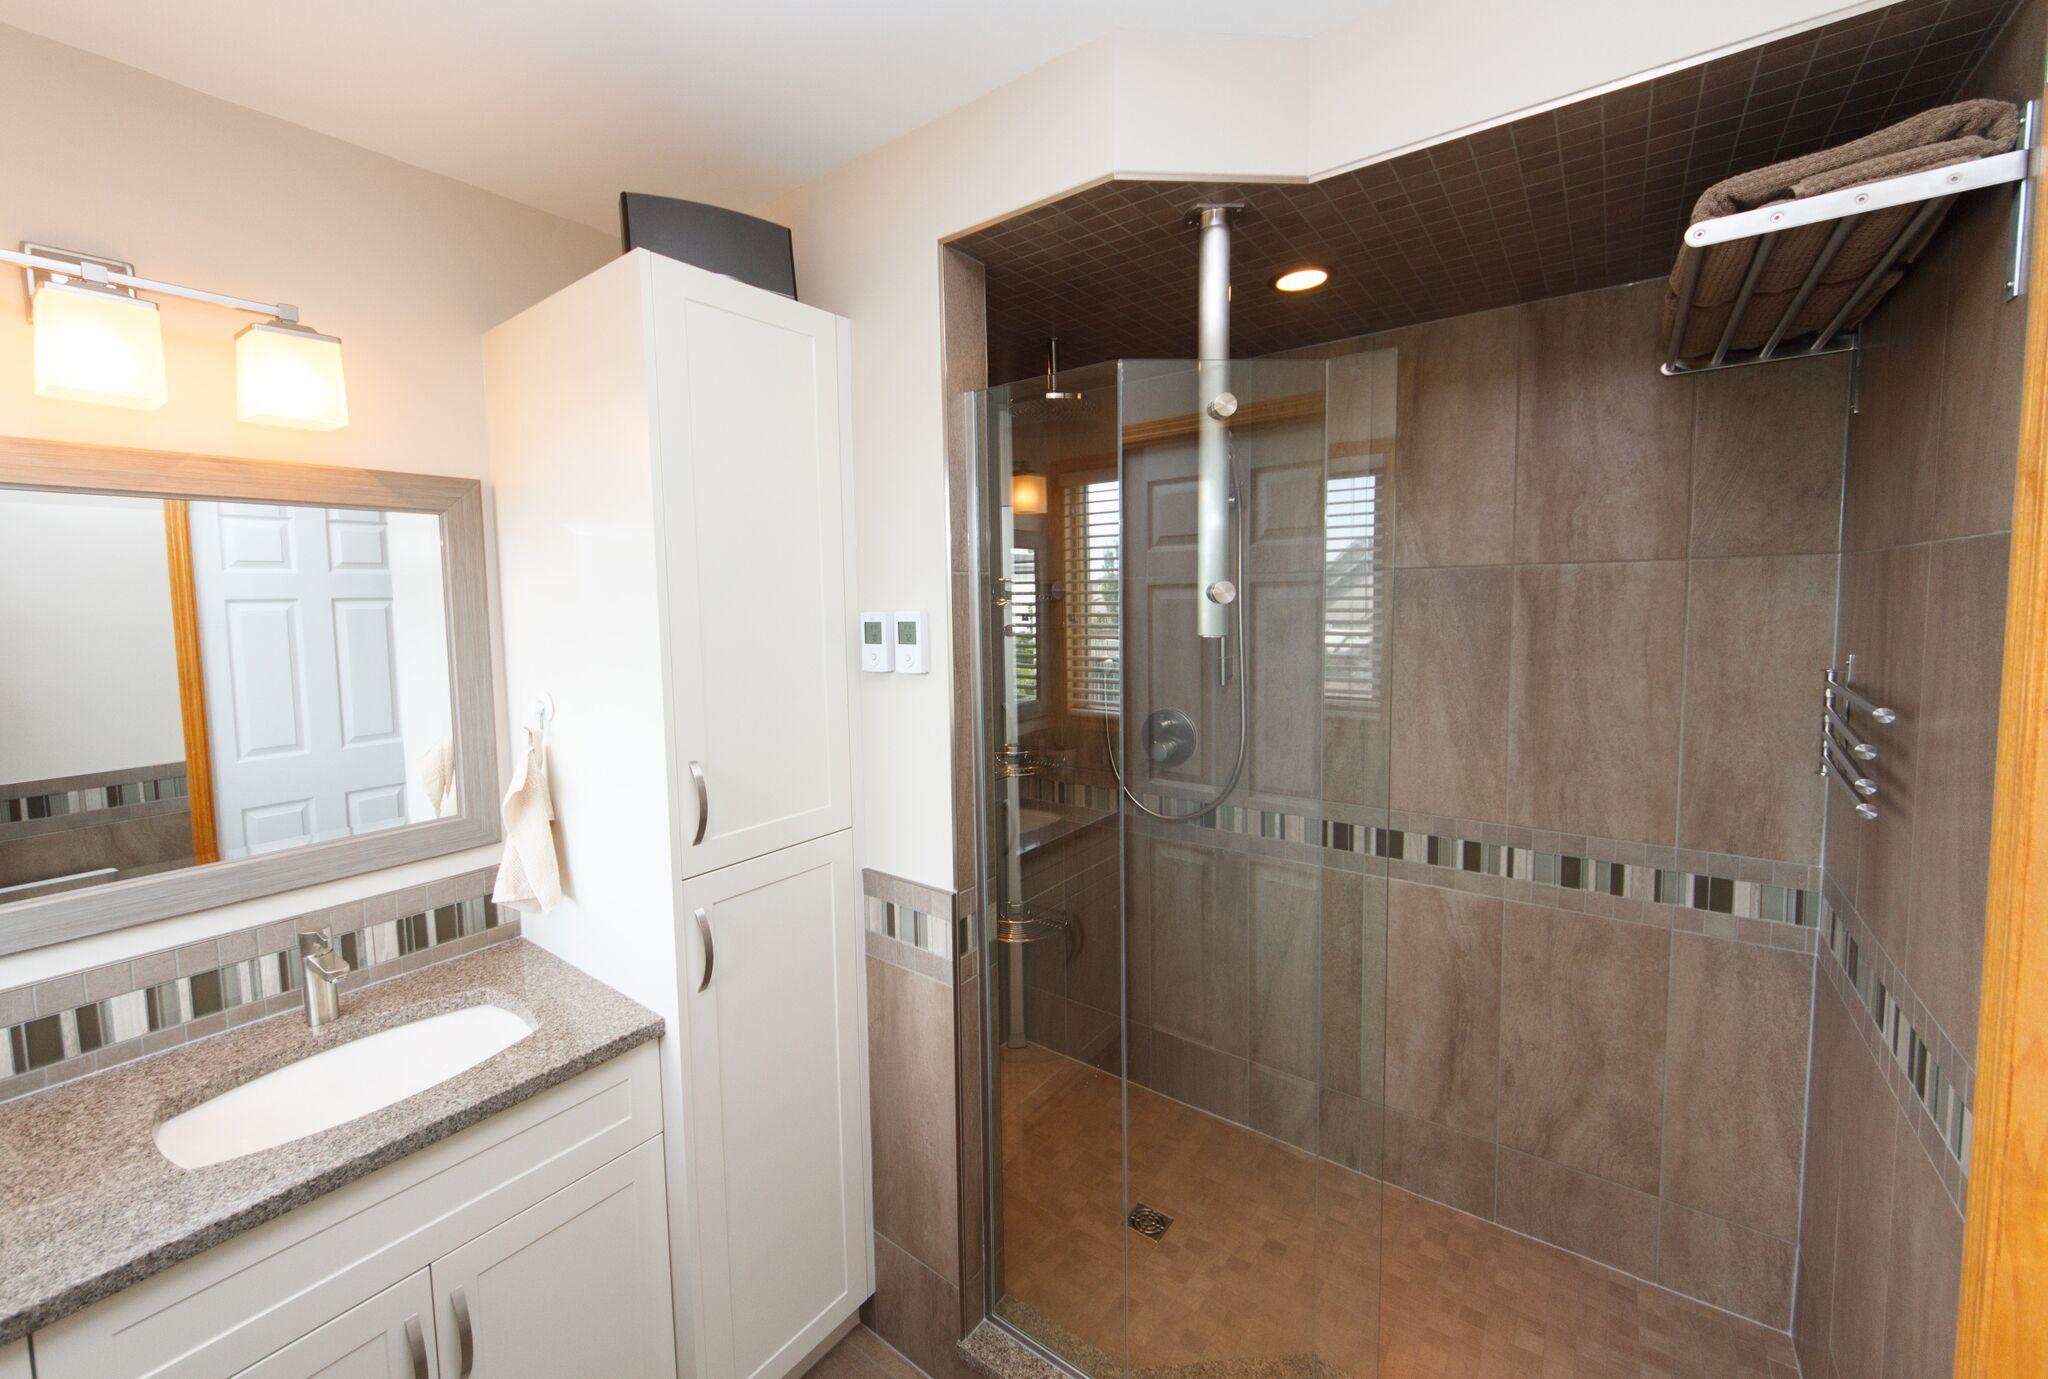 Ensuite Bathroom Winnipeg bathrooms made beautiful in winnipeg | aqua-tech